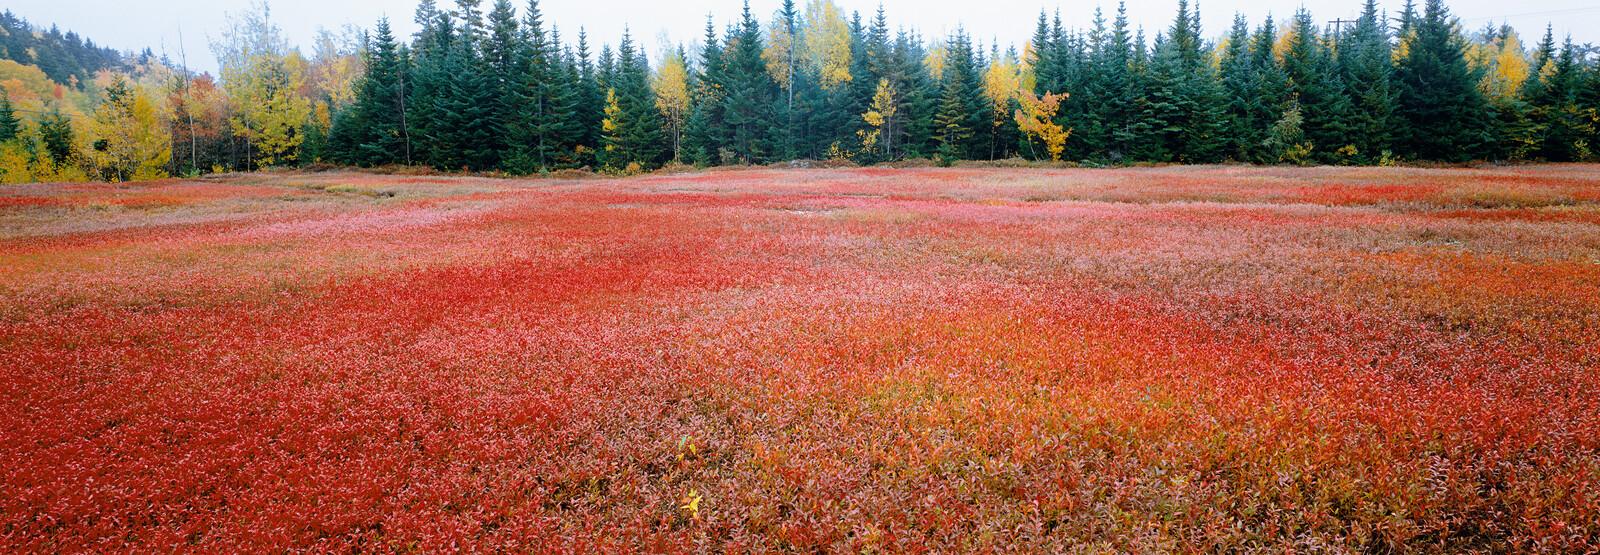 Autumn, New Brunswick, Canada - Axel M. Mosler